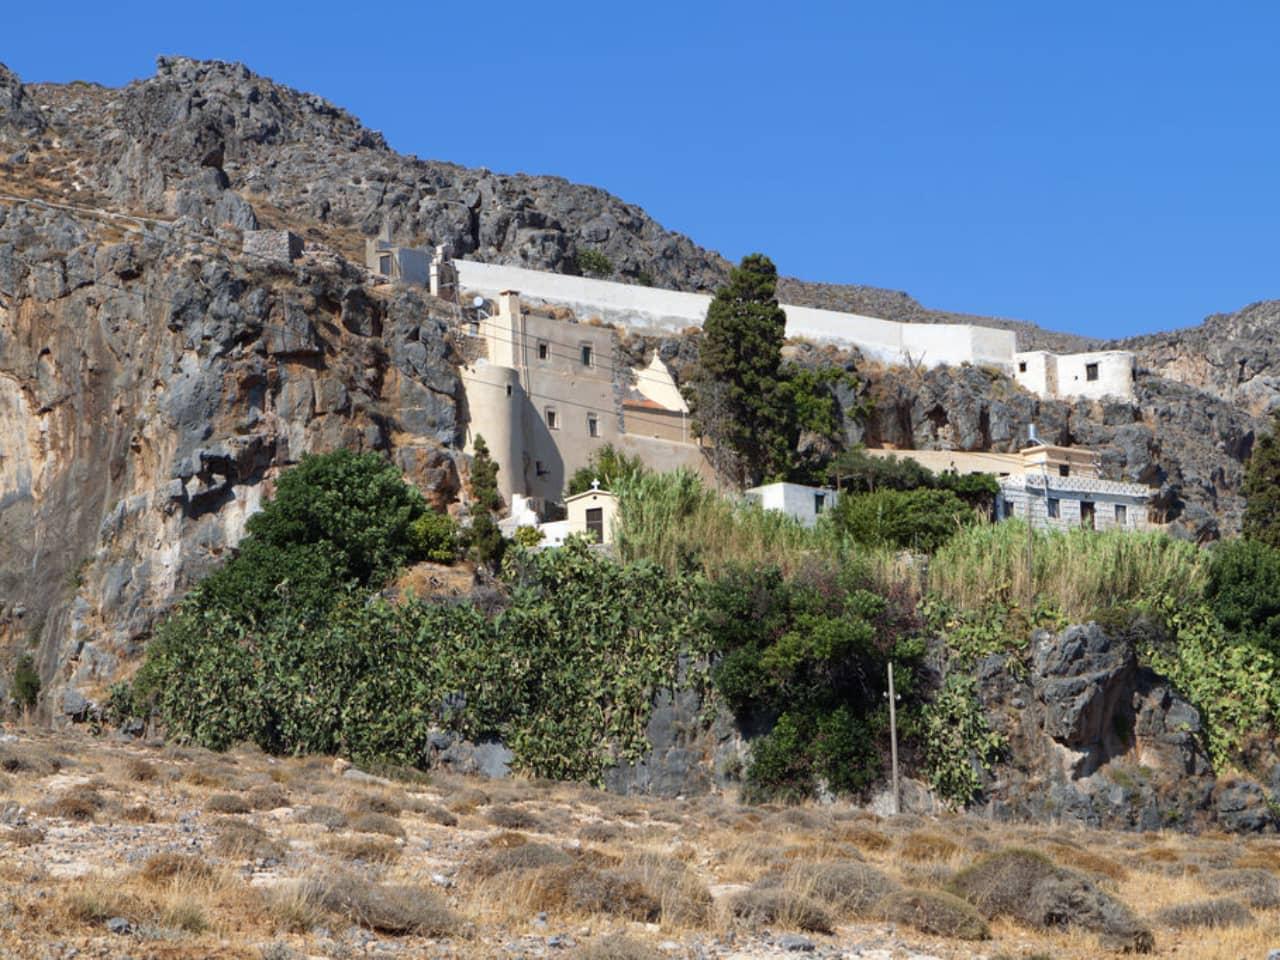 Kapsa_Monastery_Inspires_Awe_To_Visitor